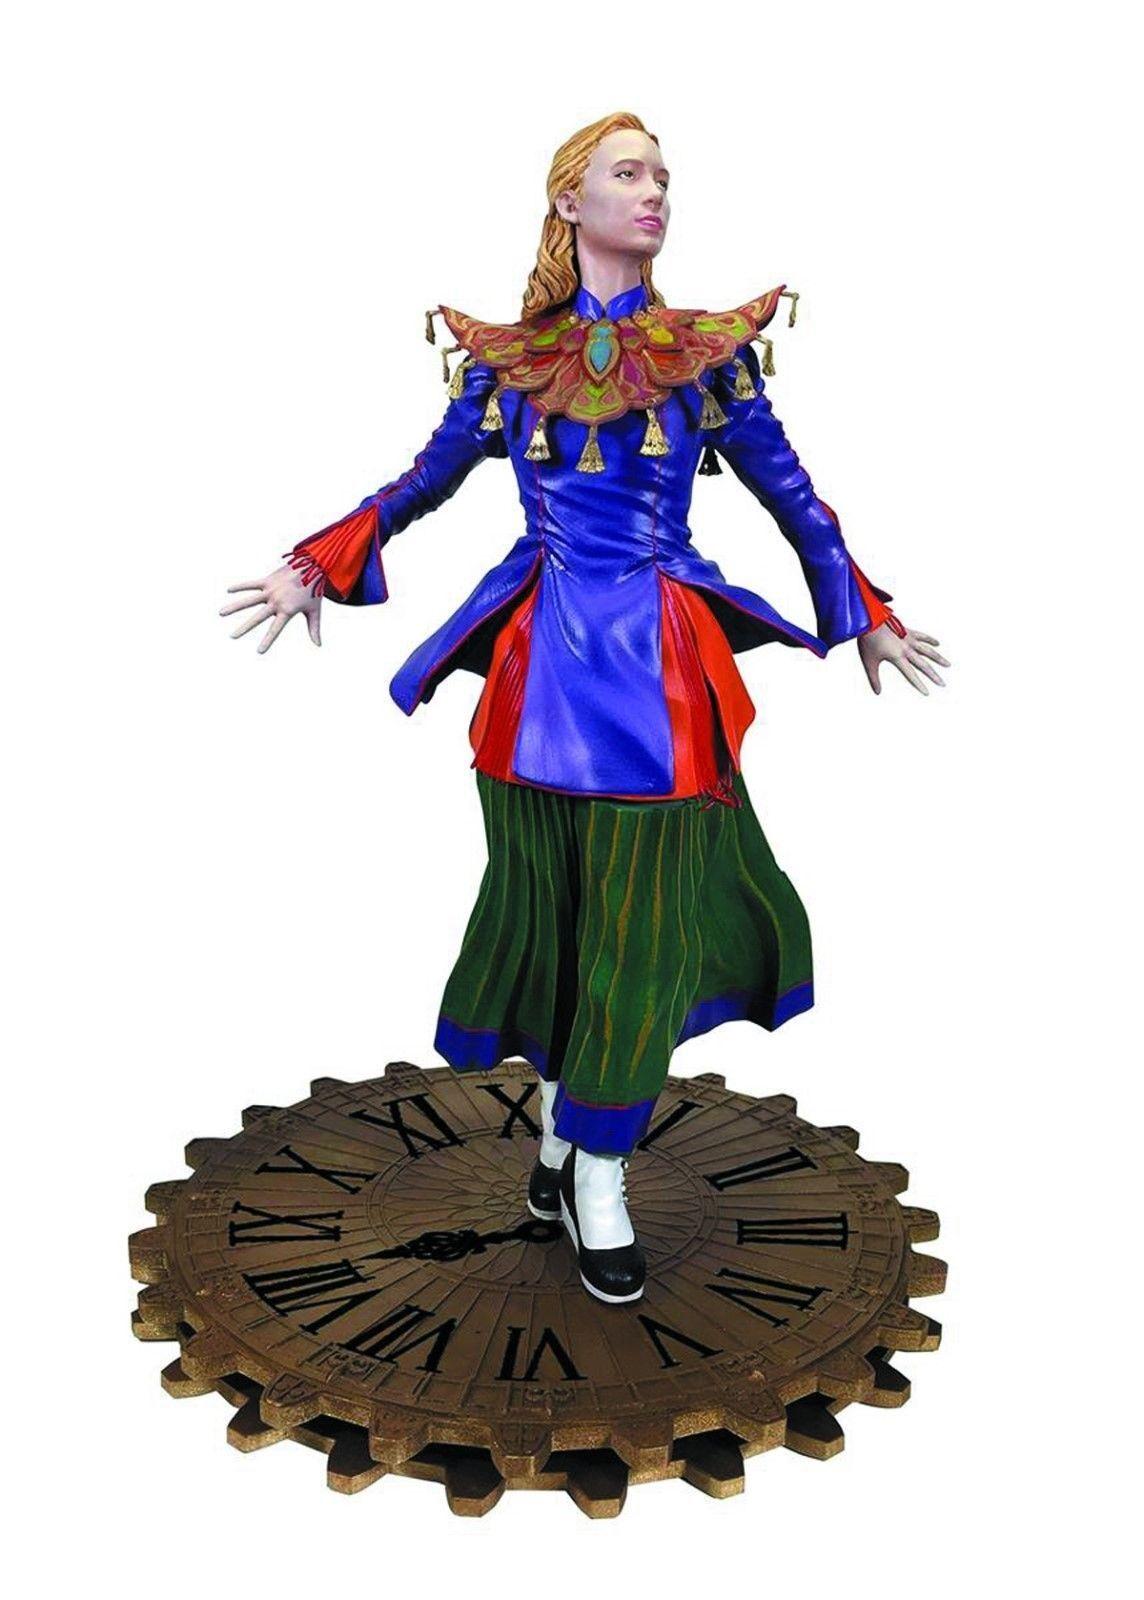 Alice hinter dem spiegel galerie alice kingsleigh pvc figure